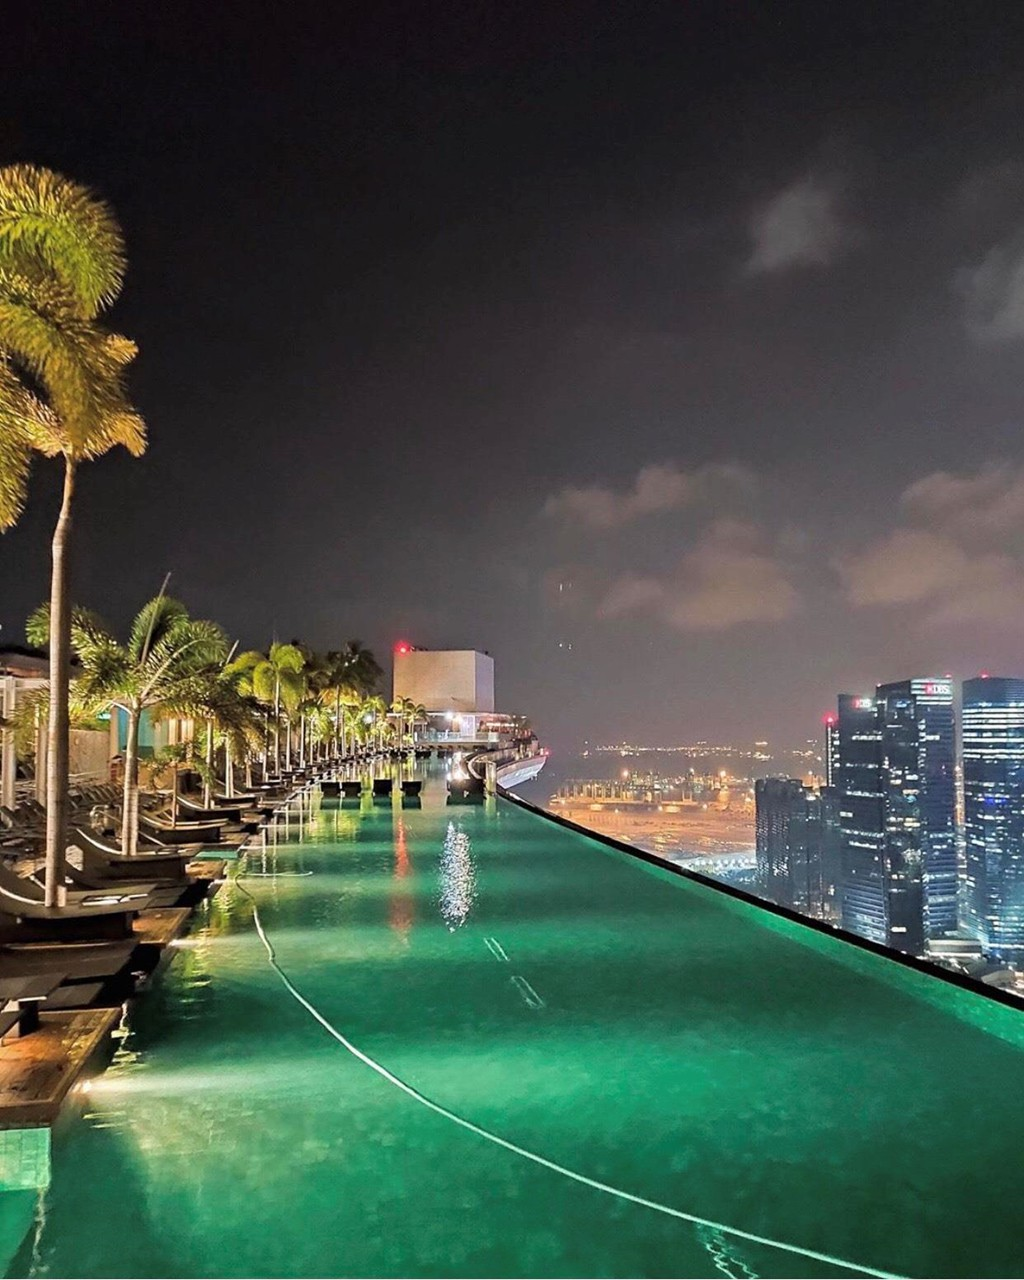 Do sang chanh cua khu nghi duong noi tieng nhat Singapore hinh anh 4